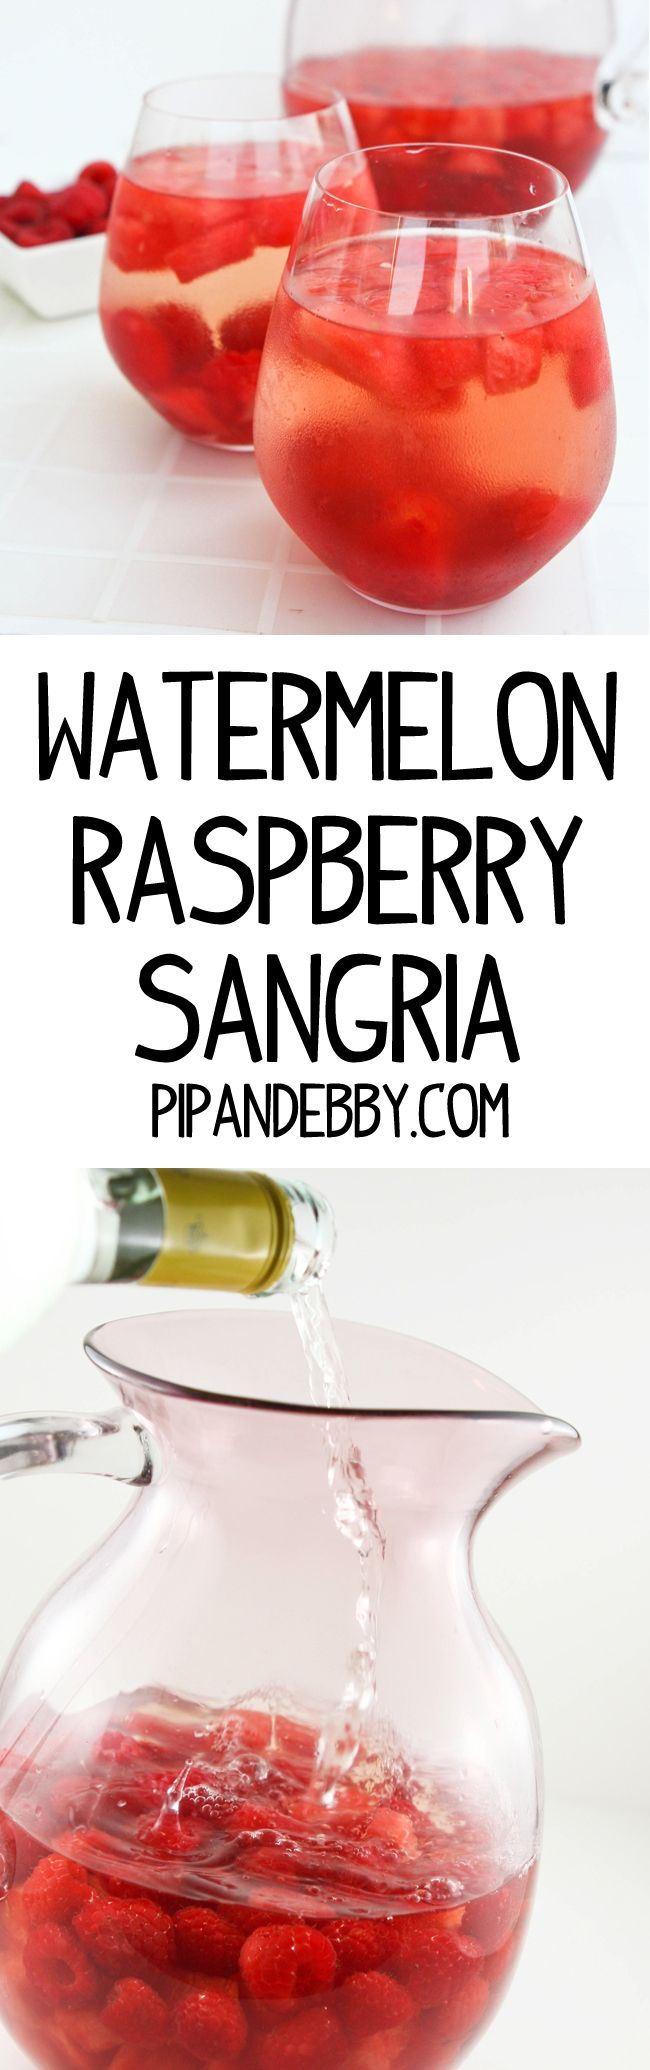 Watermelon RaspberrySangria - this sangria is super refreshing!